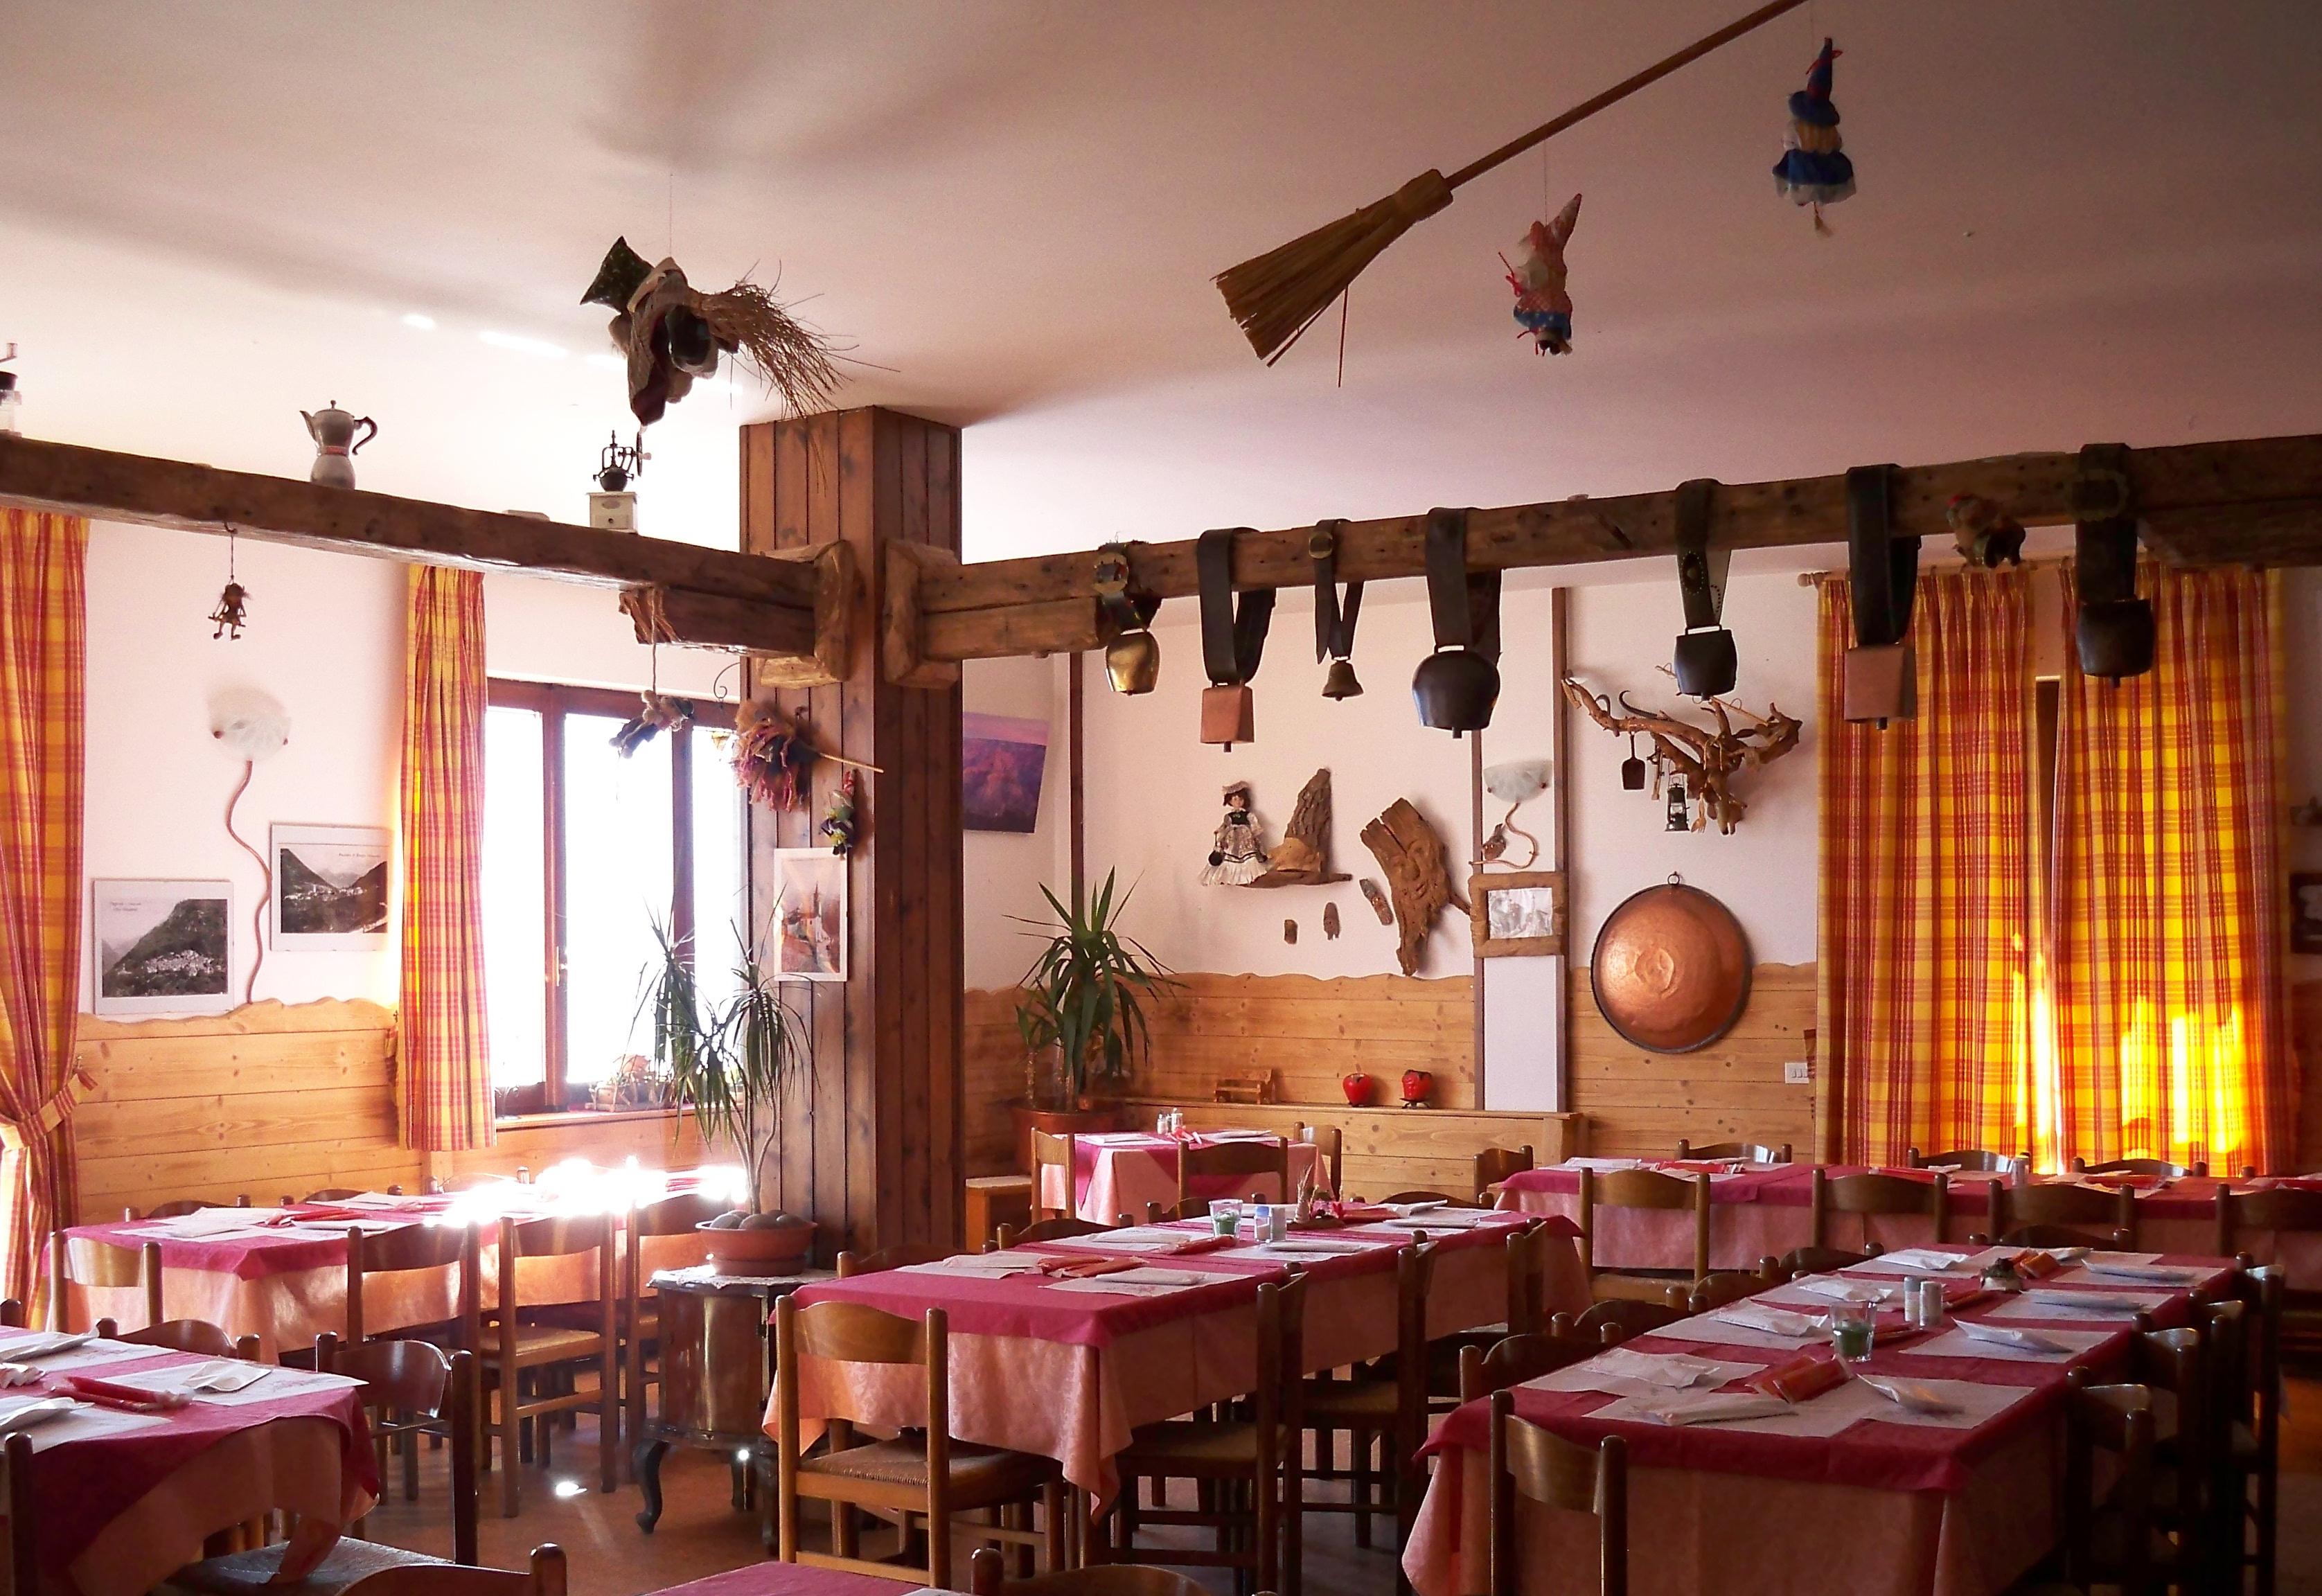 Trattoria Pizzeria Belvedere